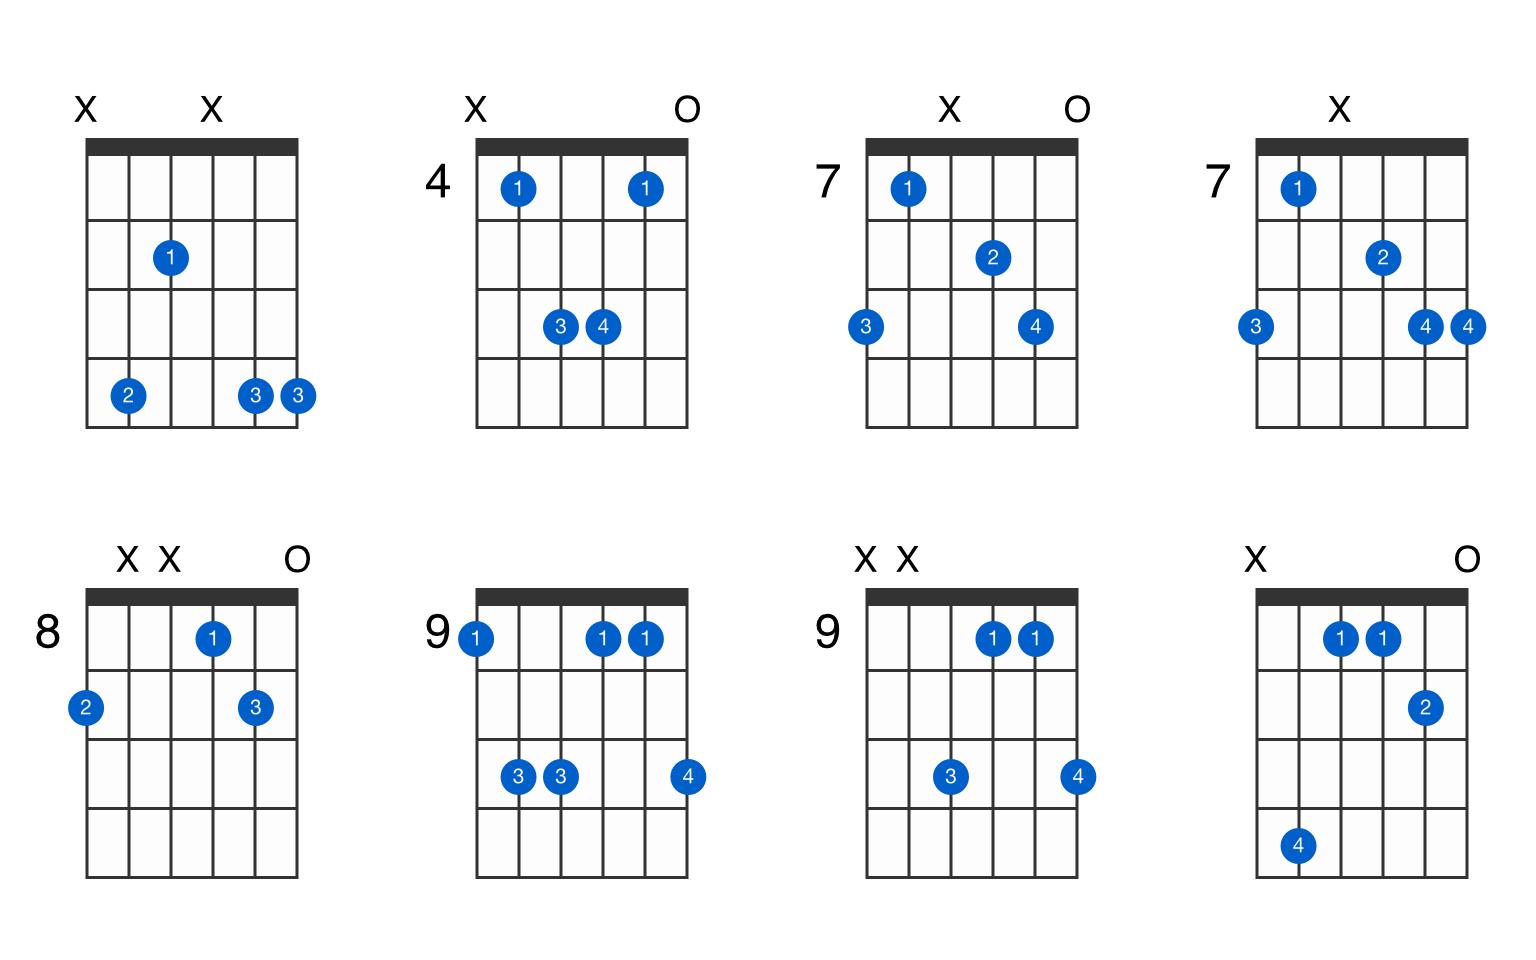 D♭madd15 guitar chord   GtrLib Chords